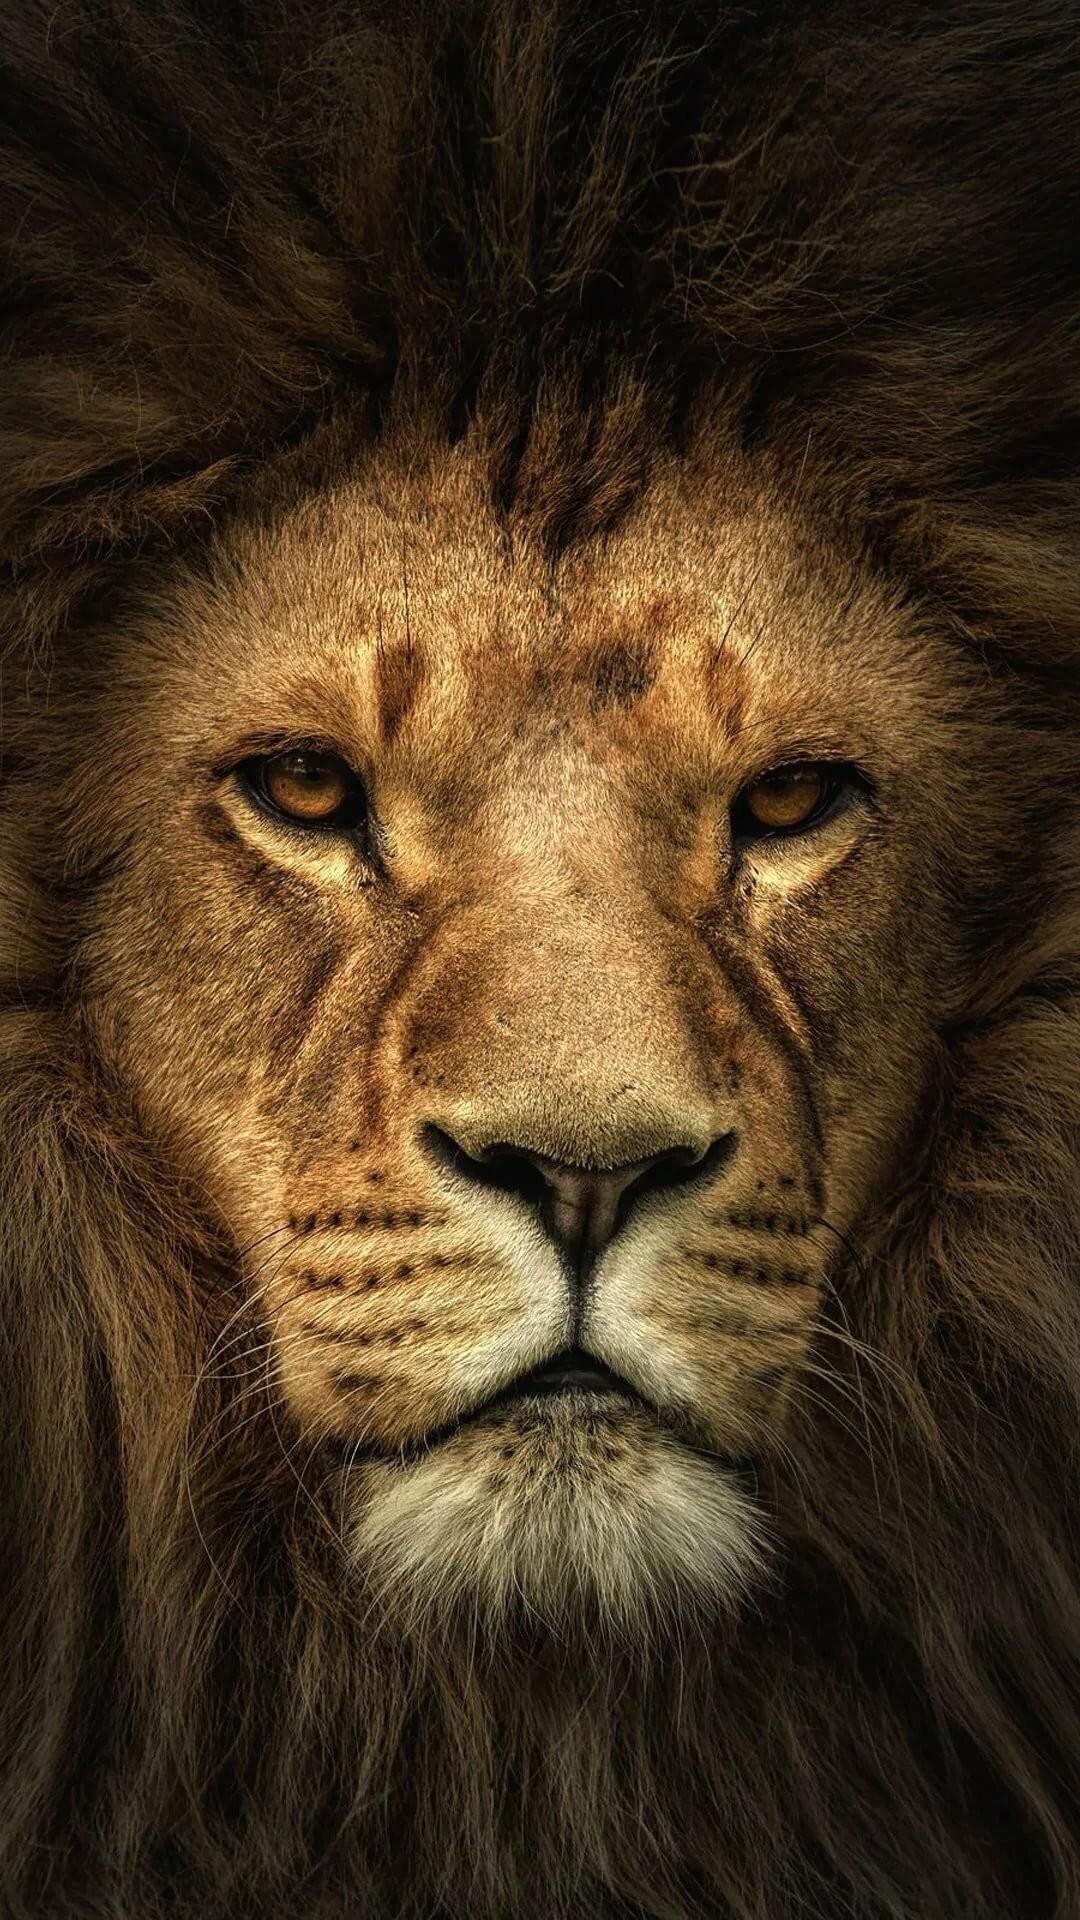 Lion iPhone hd wallpaper